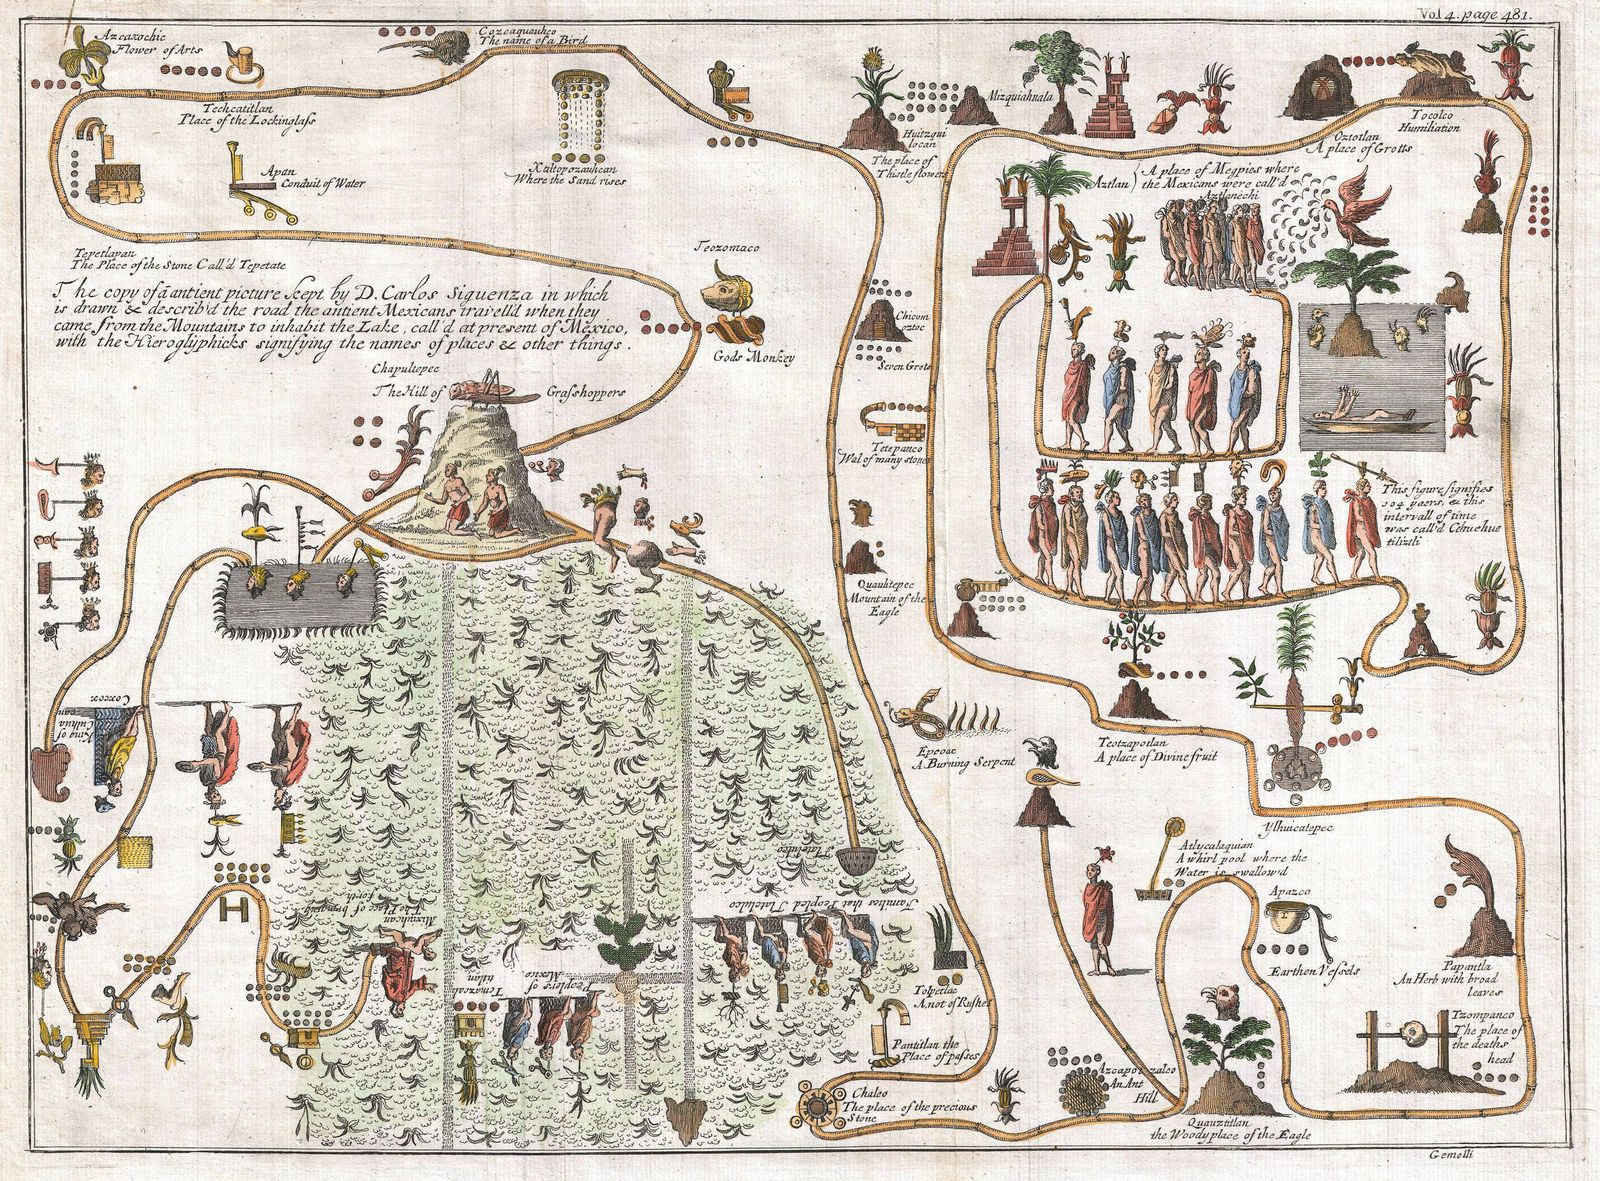 1704 Gemelli Map of the Aztec Migration from Aztlan to Chapultapec PUBLICATIONxINxGERxSUIxAUTxONLY